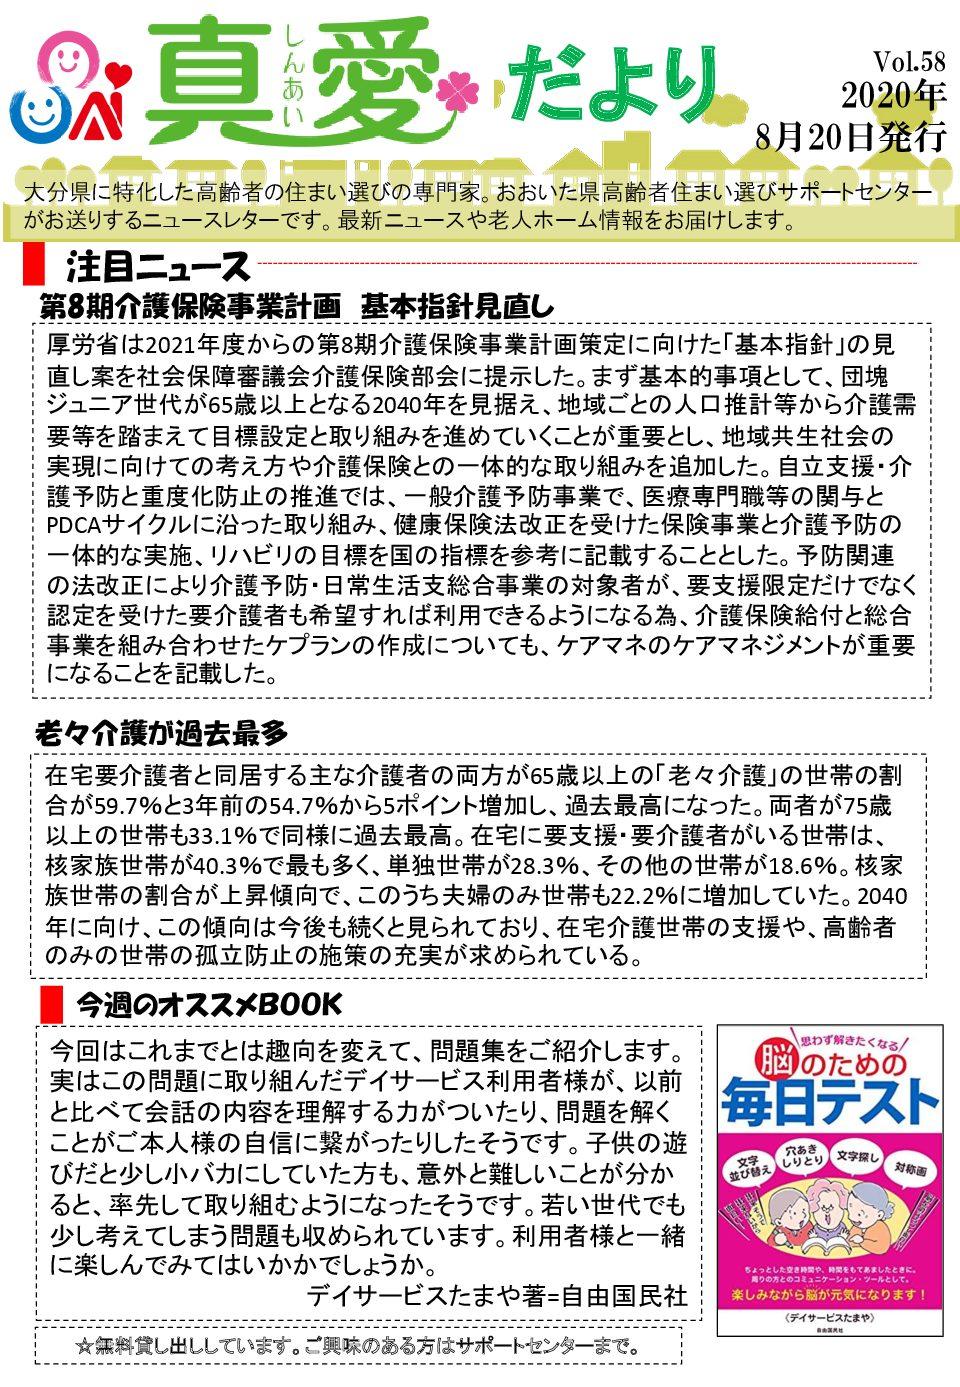 【Vol.58】 2020.08.20発行